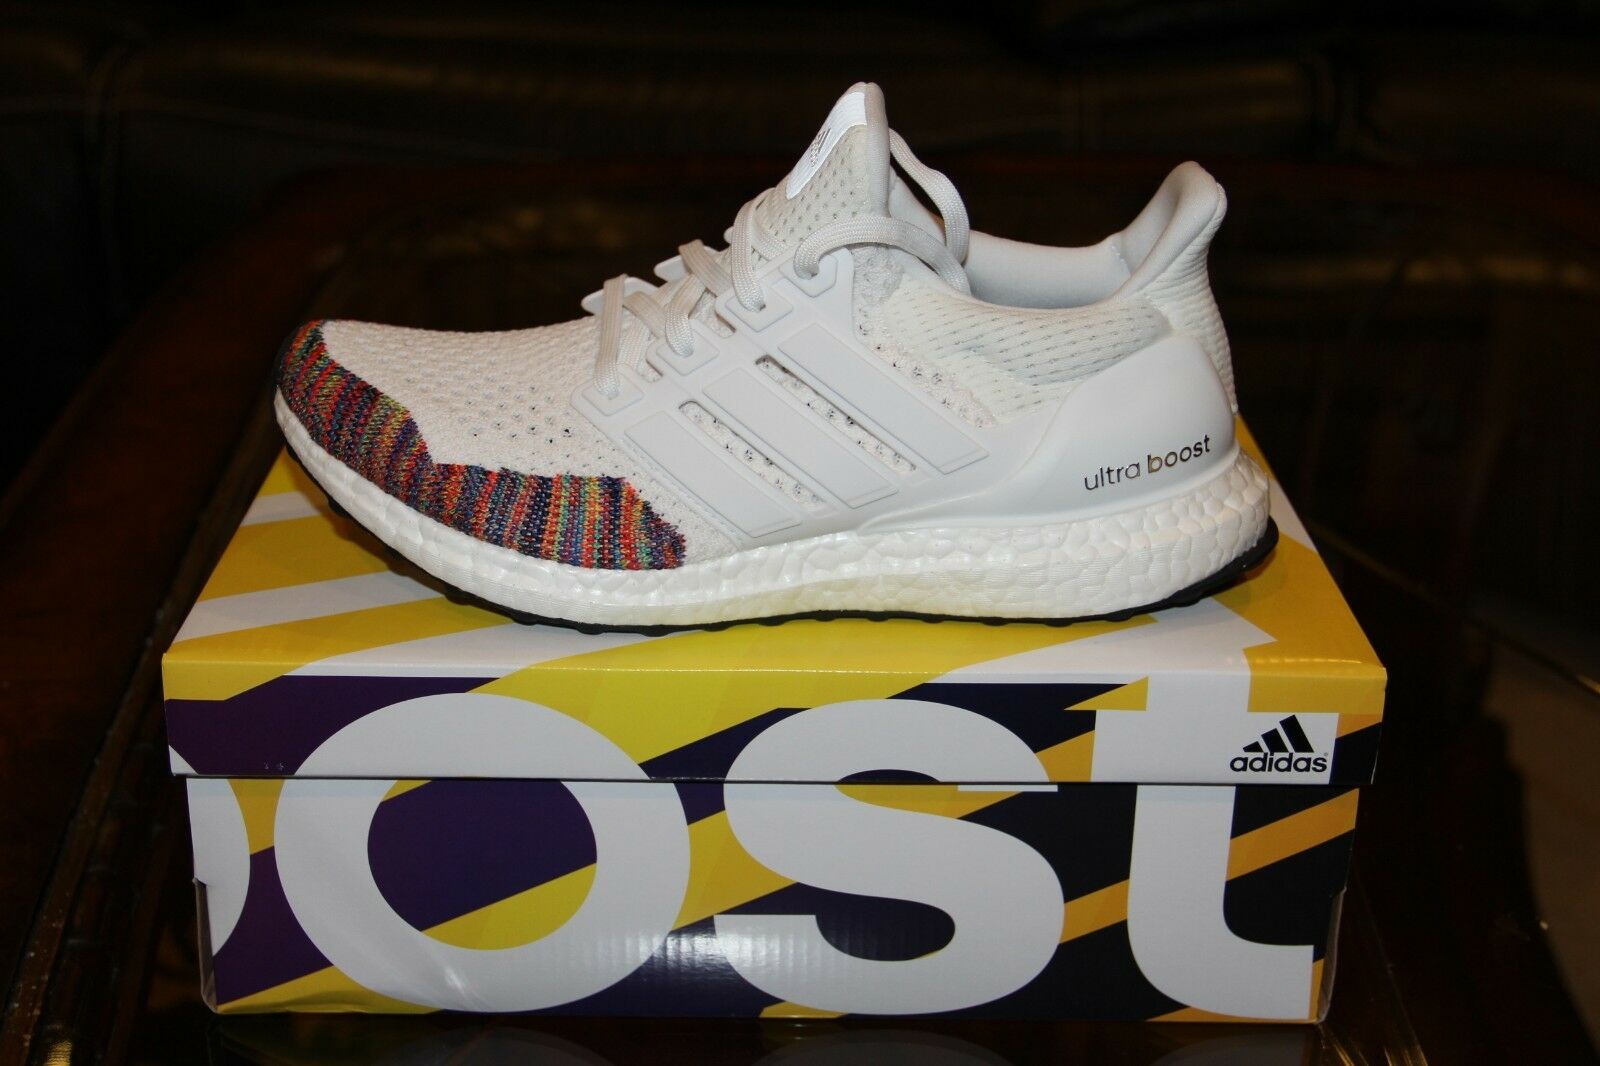 85472623daa UltraBOOST 1.0 LTD White Multicolor SIZE 9.5 Adidas Toe noekwe7687 ...